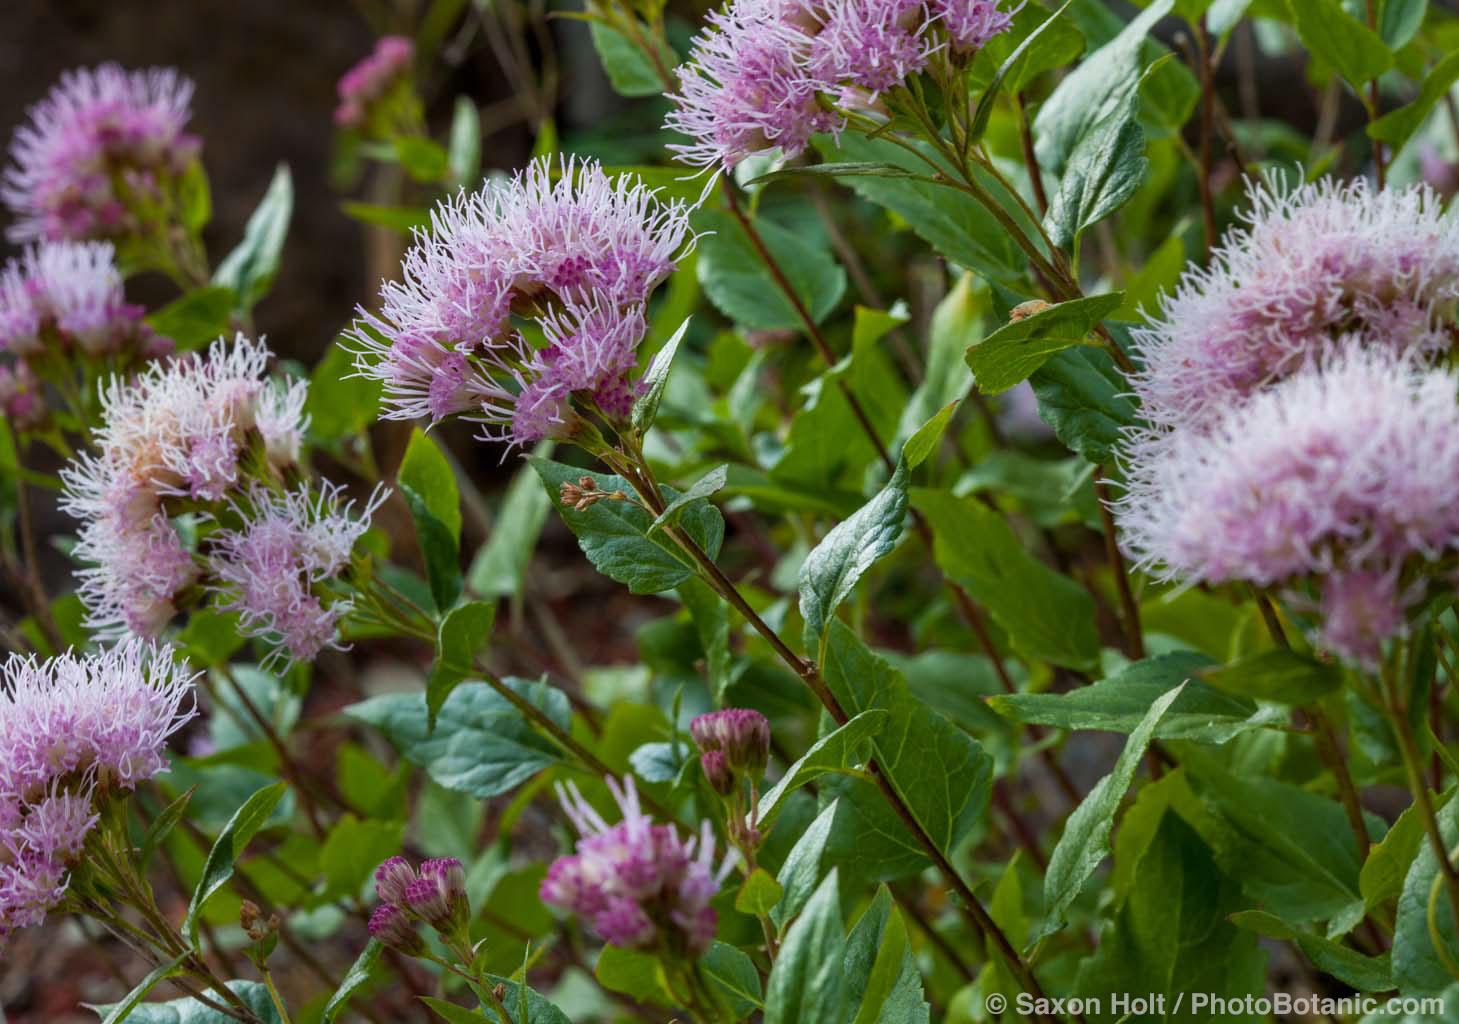 Ageratina occidentalis. Western Snakeroot flowering California native perennial